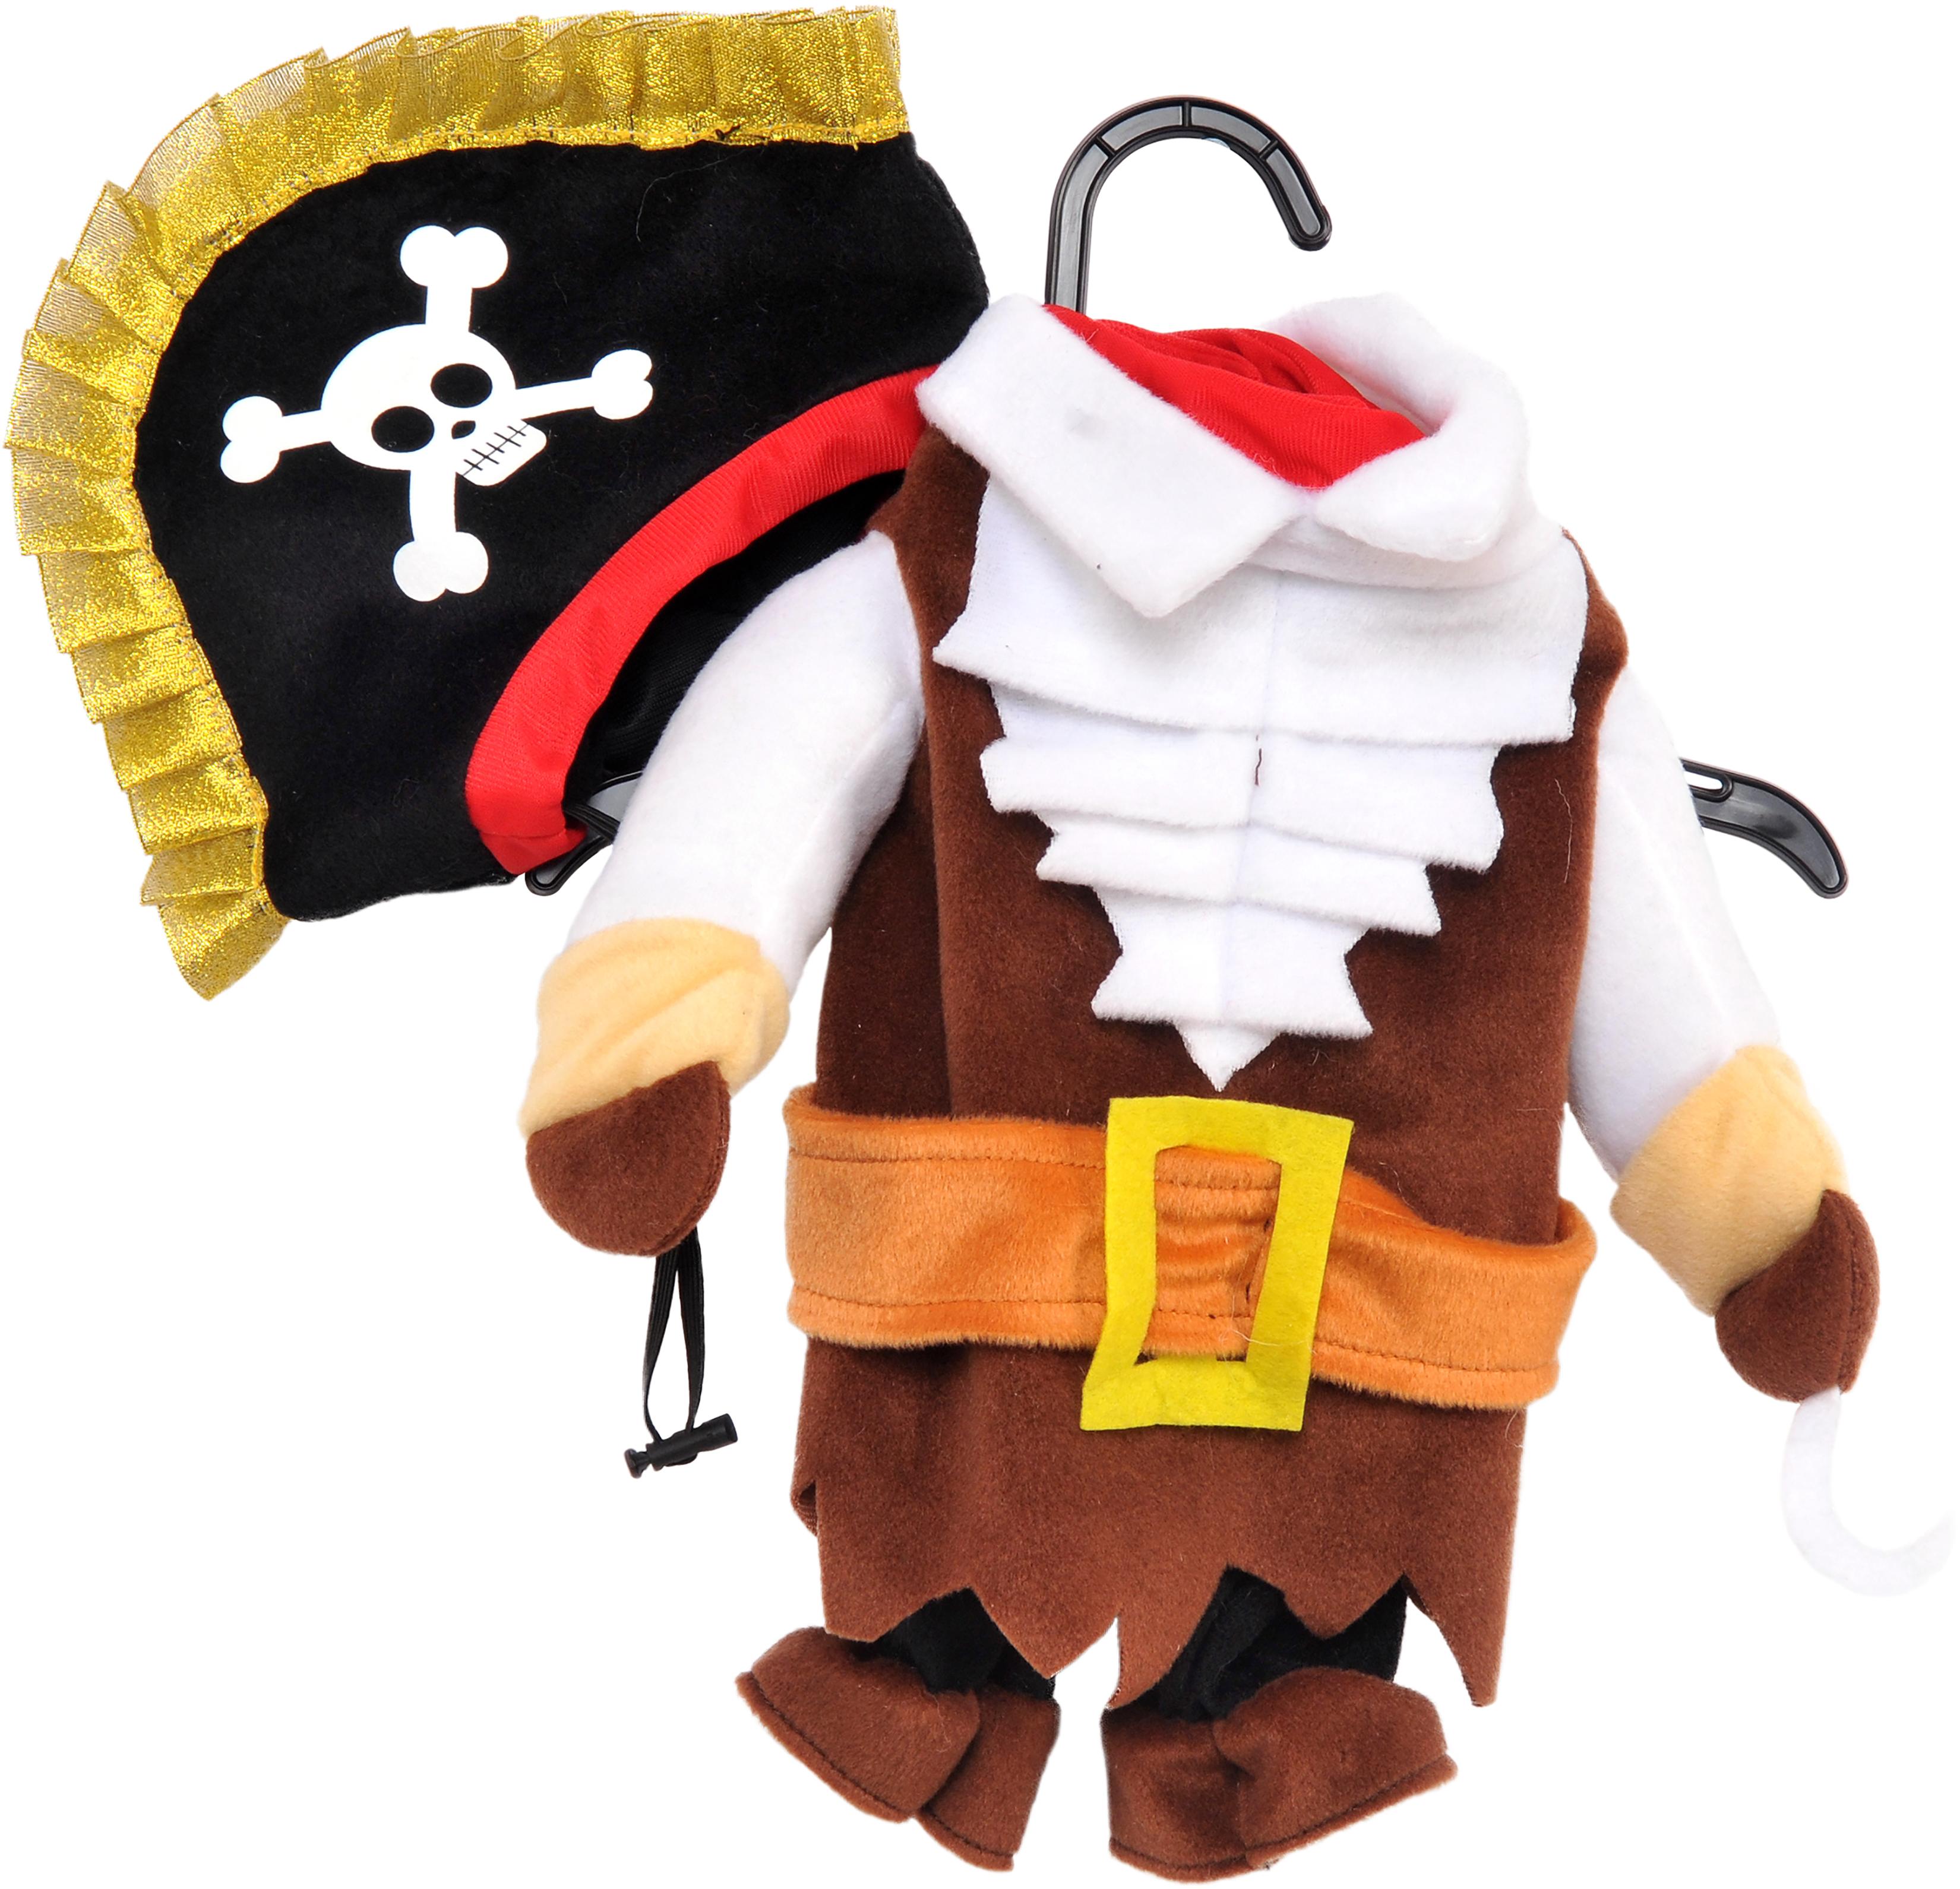 Rubie's Walking Pirate Pet Costume-Small